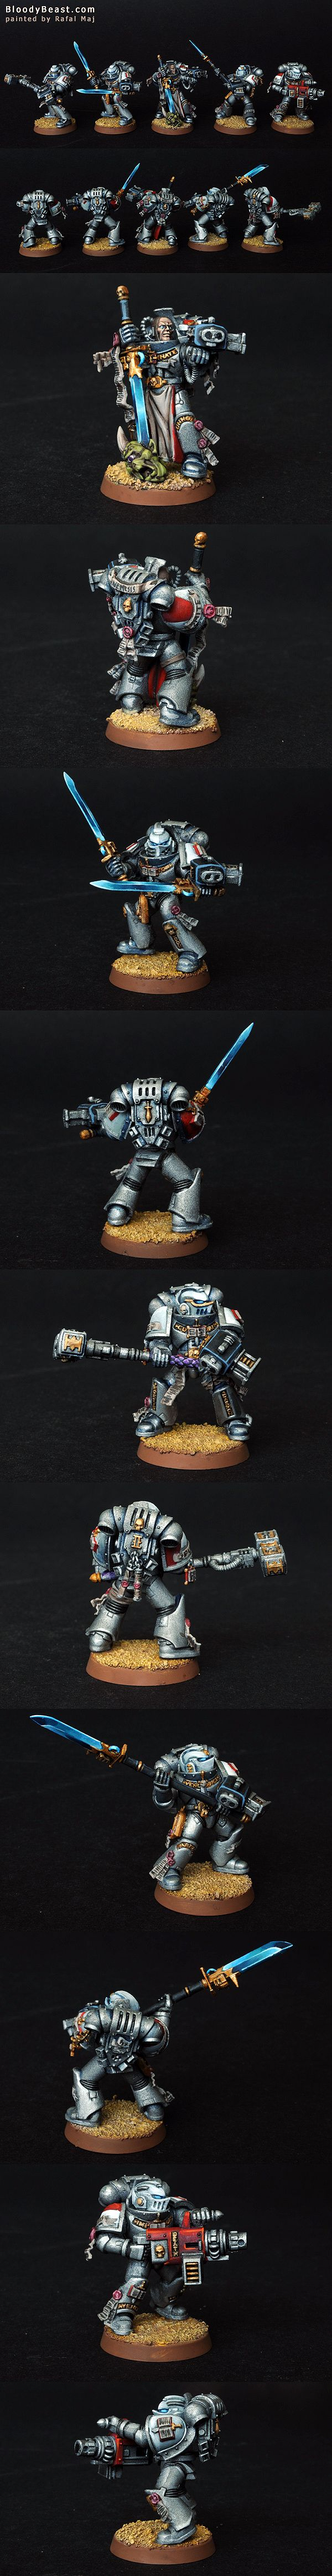 Grey Knight Squad painted by Rafal Maj (BloodyBeast.com)